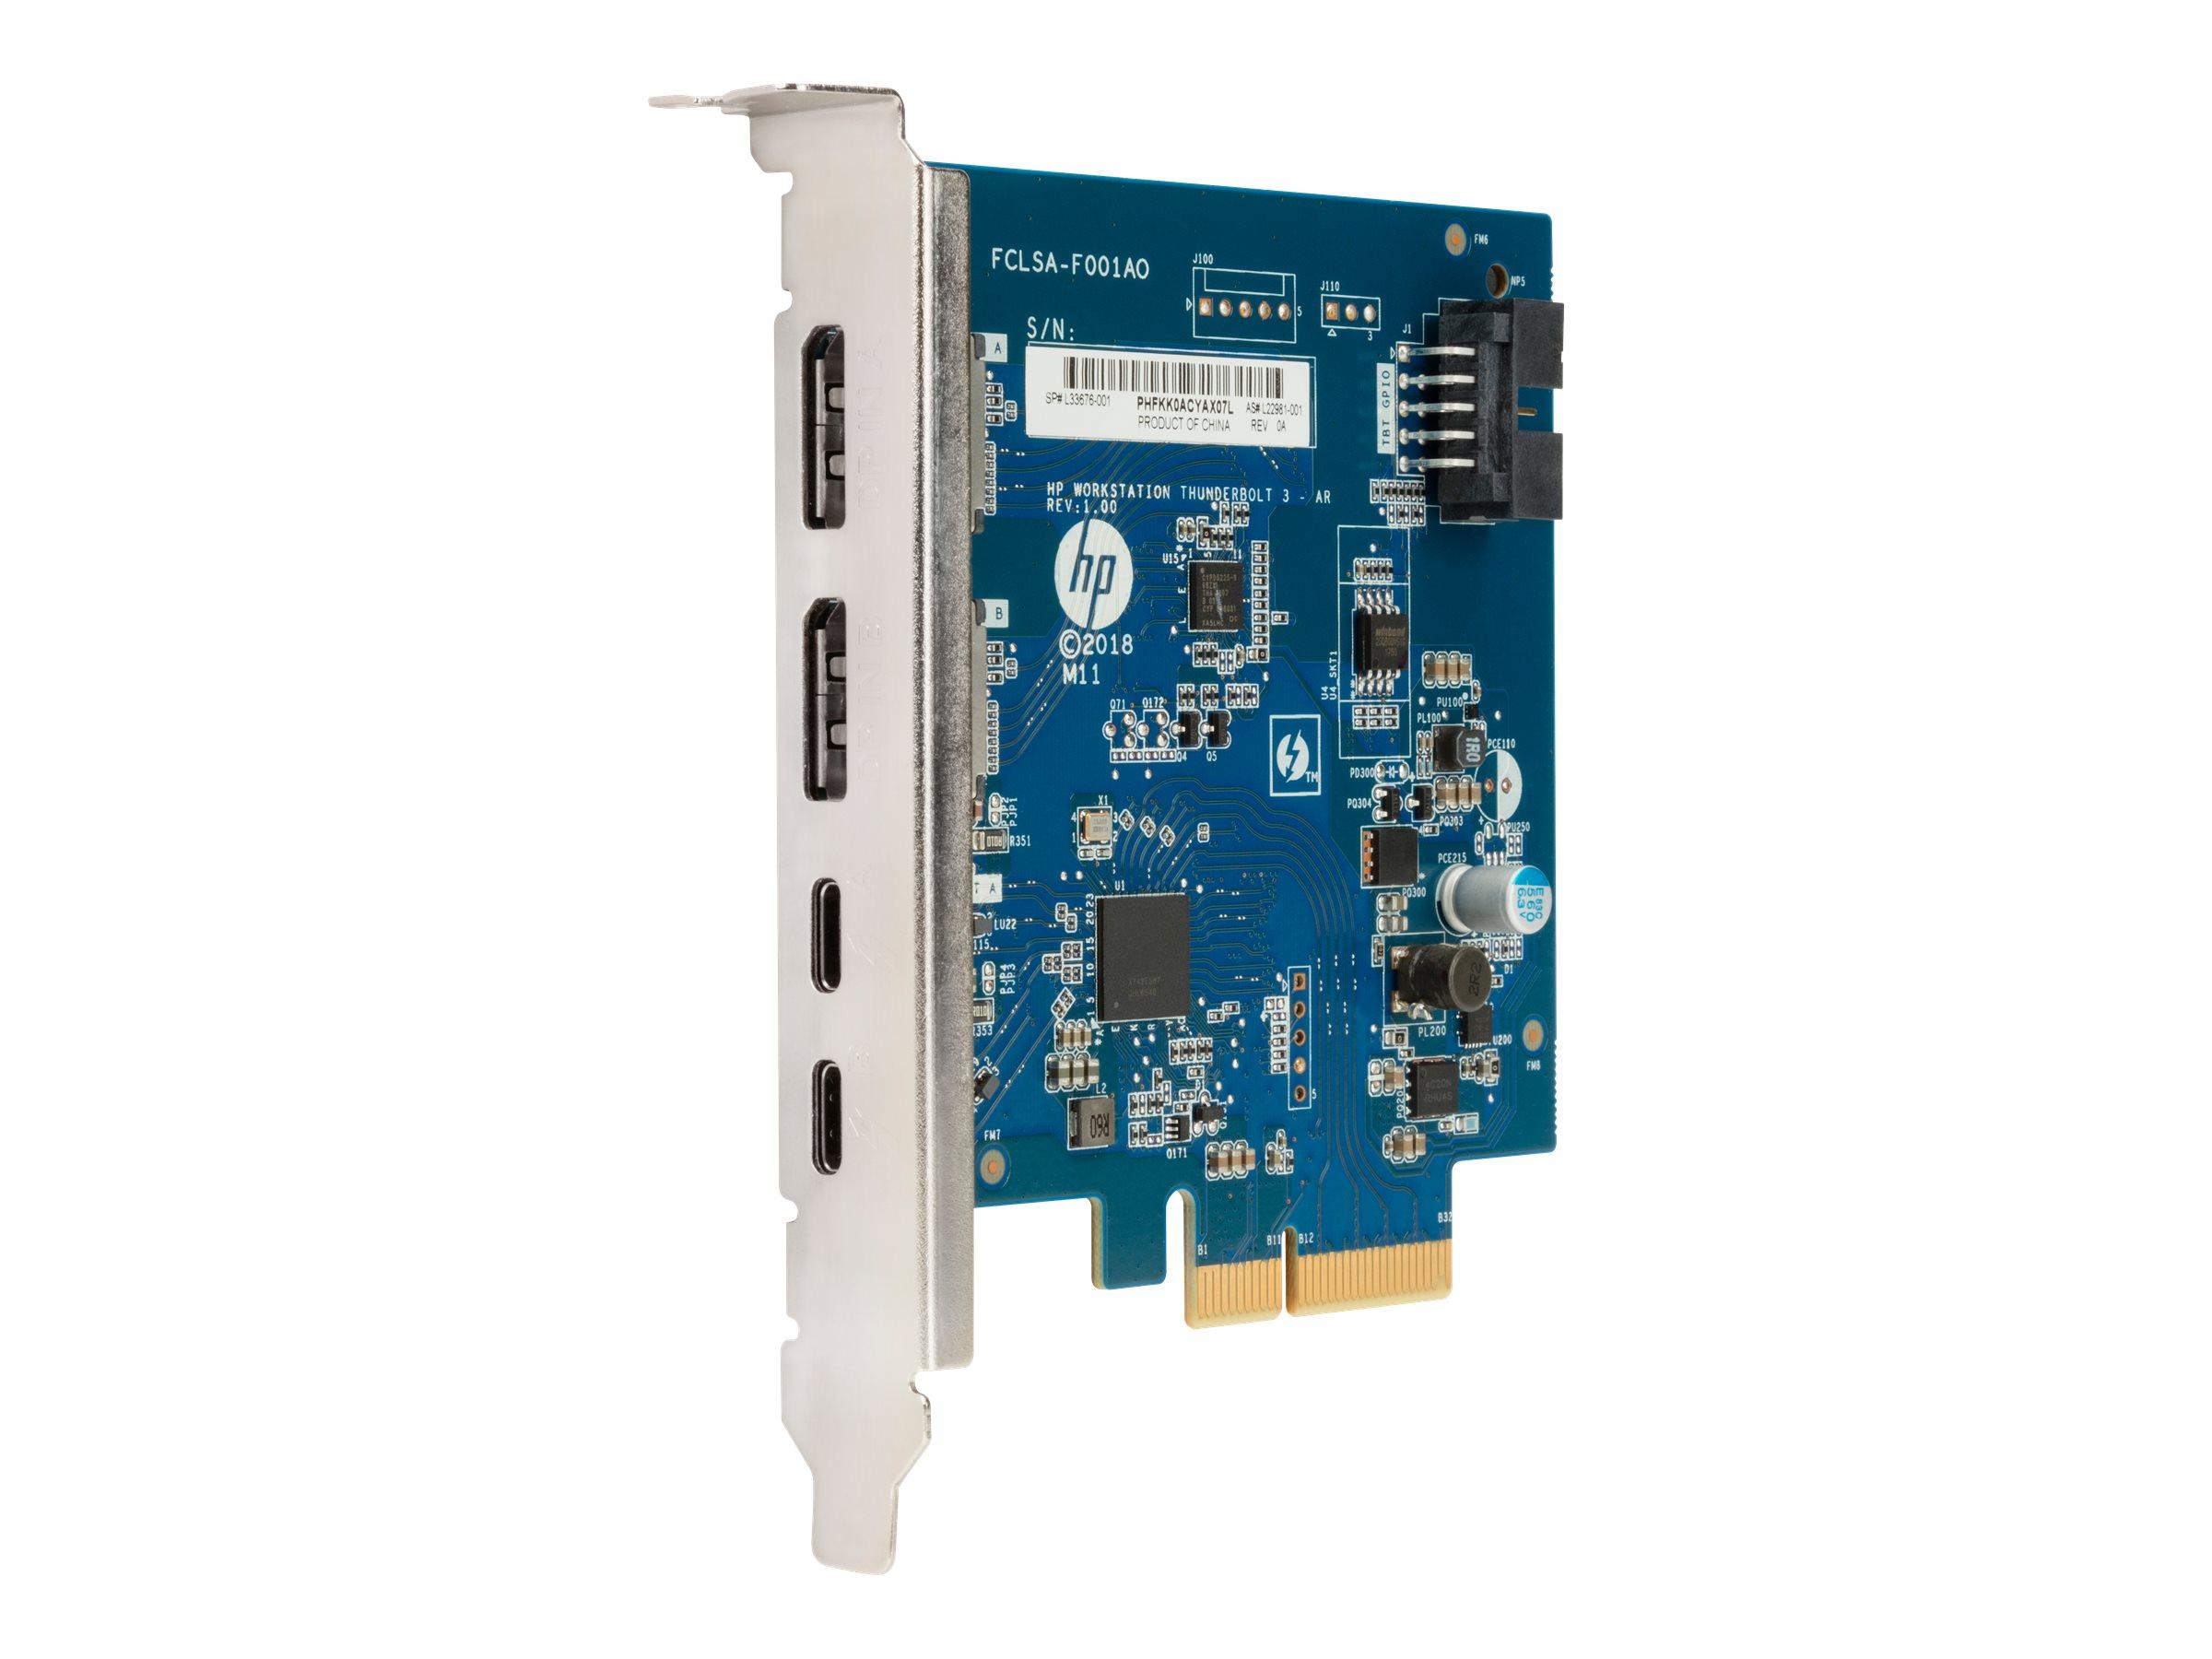 HP Dual Port Add-in-Card - Thunderbolt-Adapter - PCIe - Thunderbolt 3 x 2 - für Workstation Z1 G5 Entry